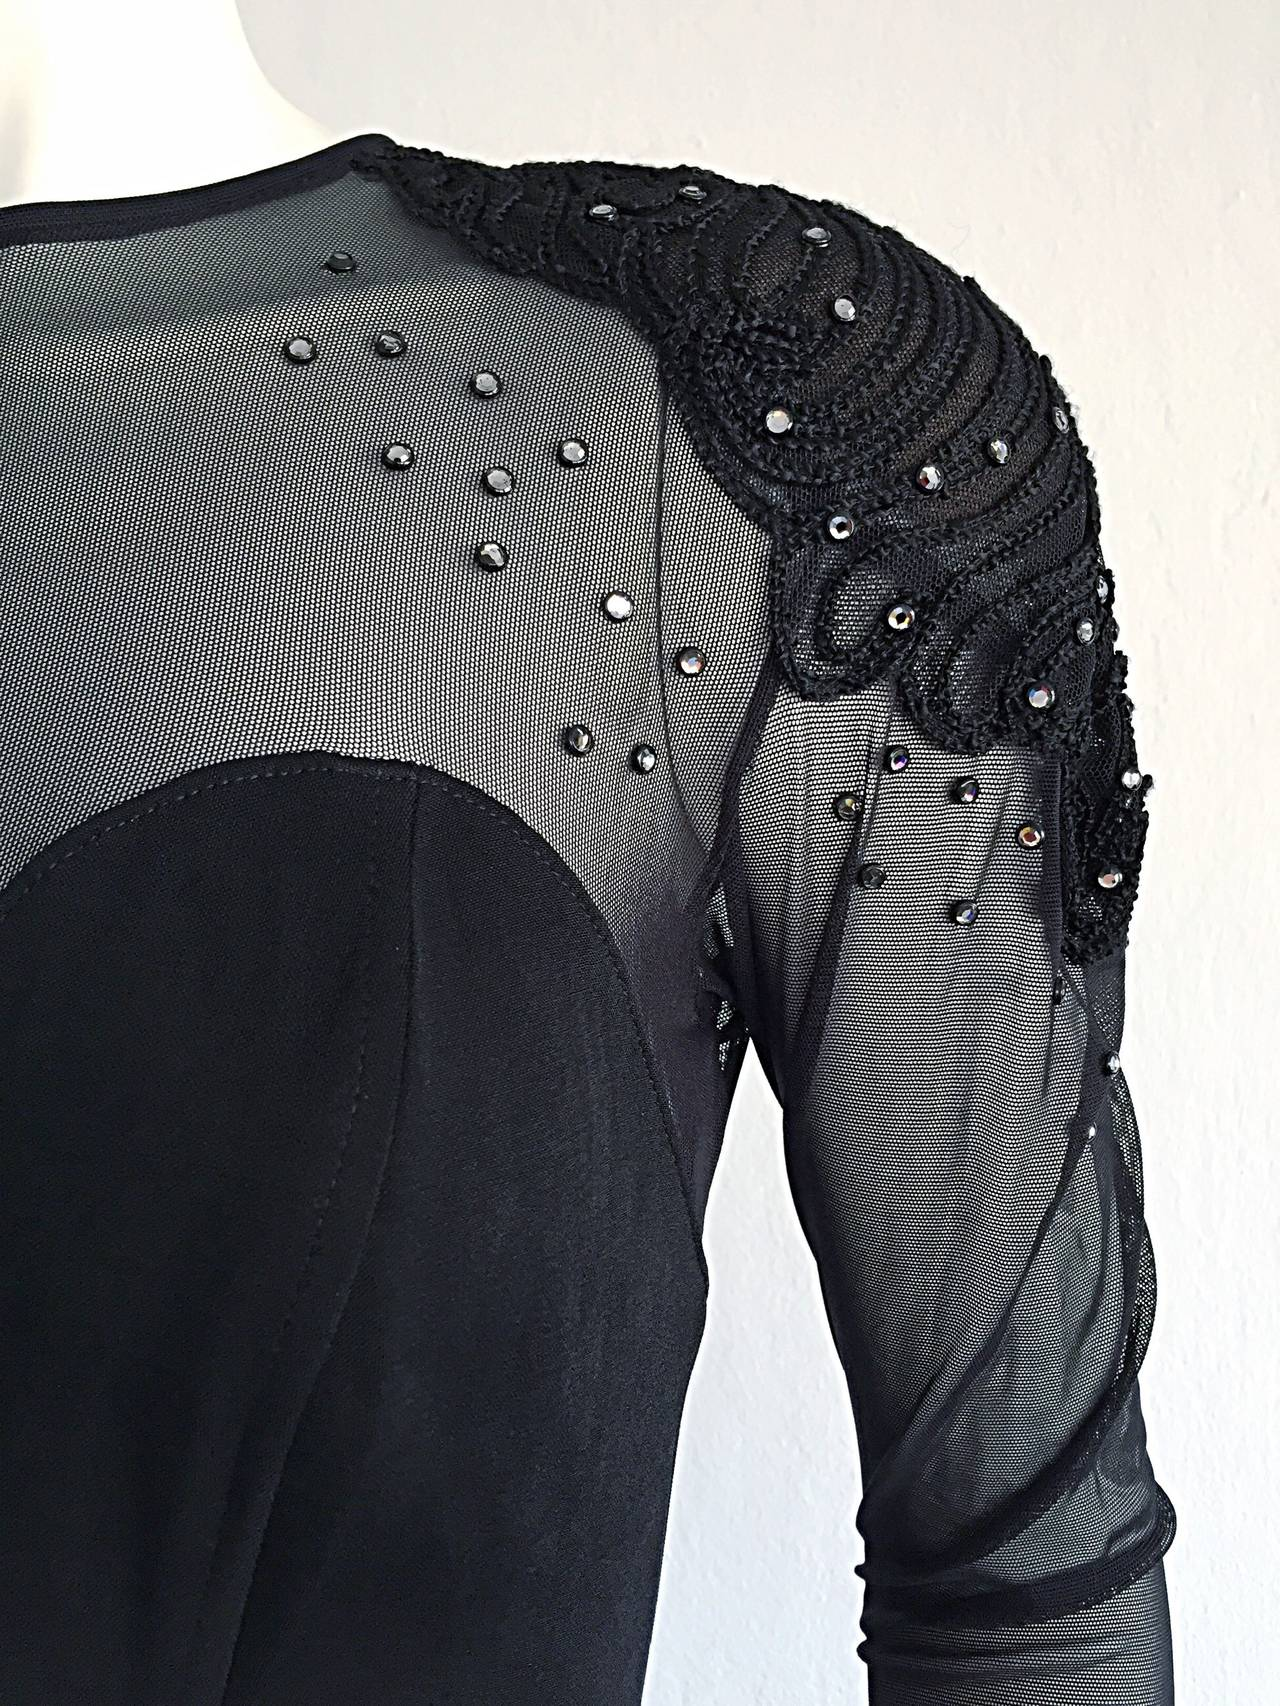 Sexy Vintage 1990s Black Cut - Out Bodycon Dress w/ Rhinestones 5